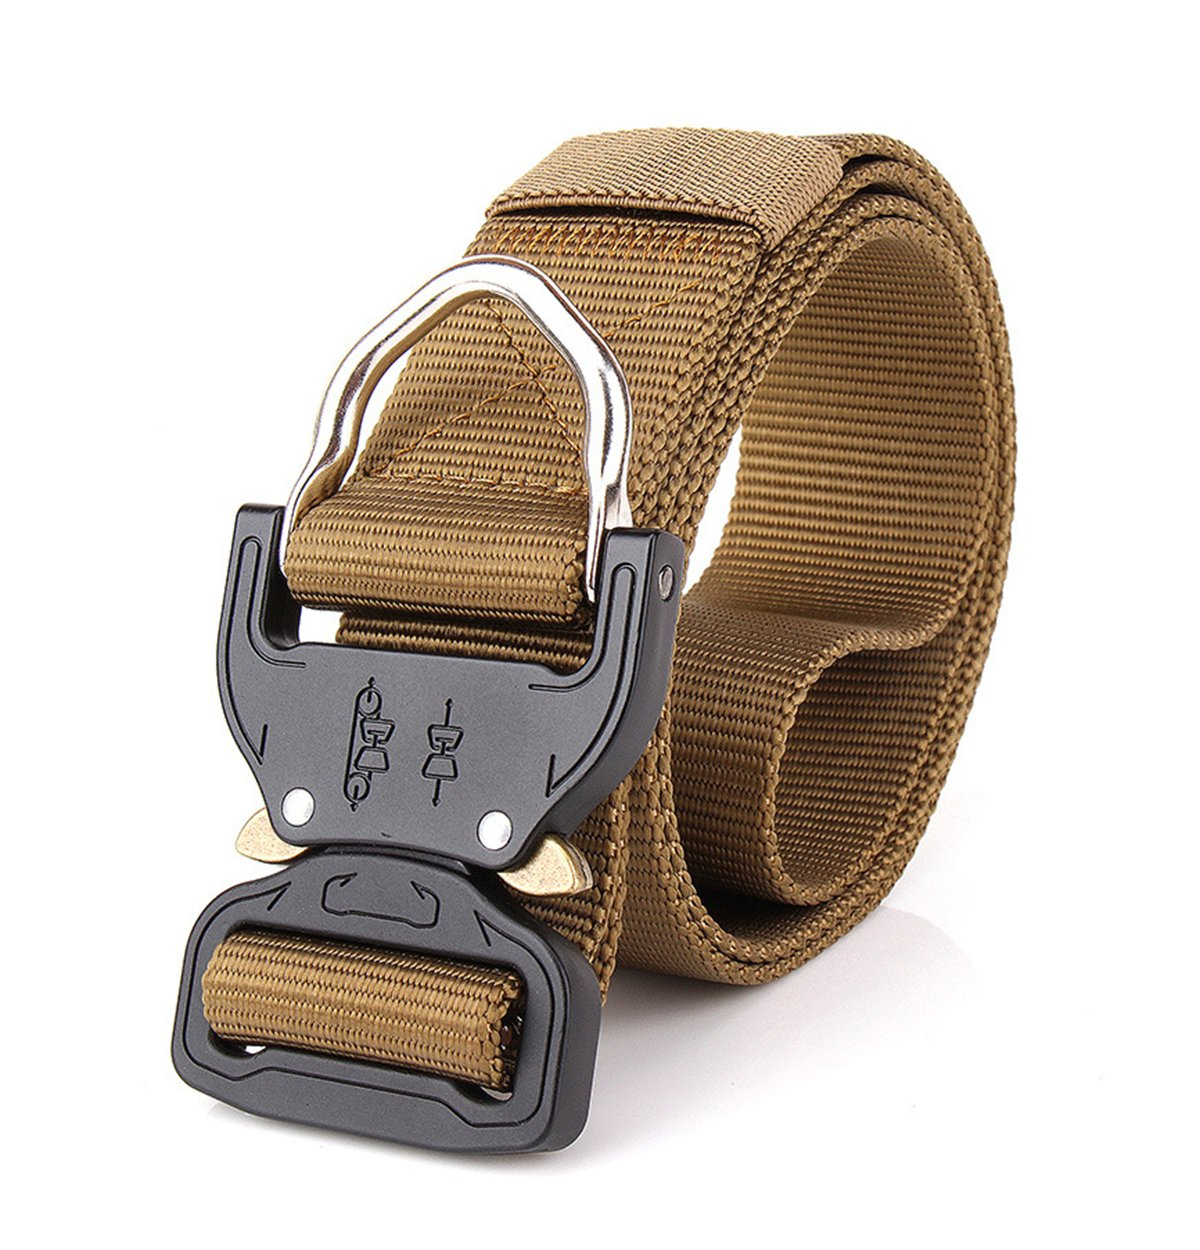 Lemu Tactical Rigger's Belt, Military Style Webbing Riggers Nylon Web Belt Khaki